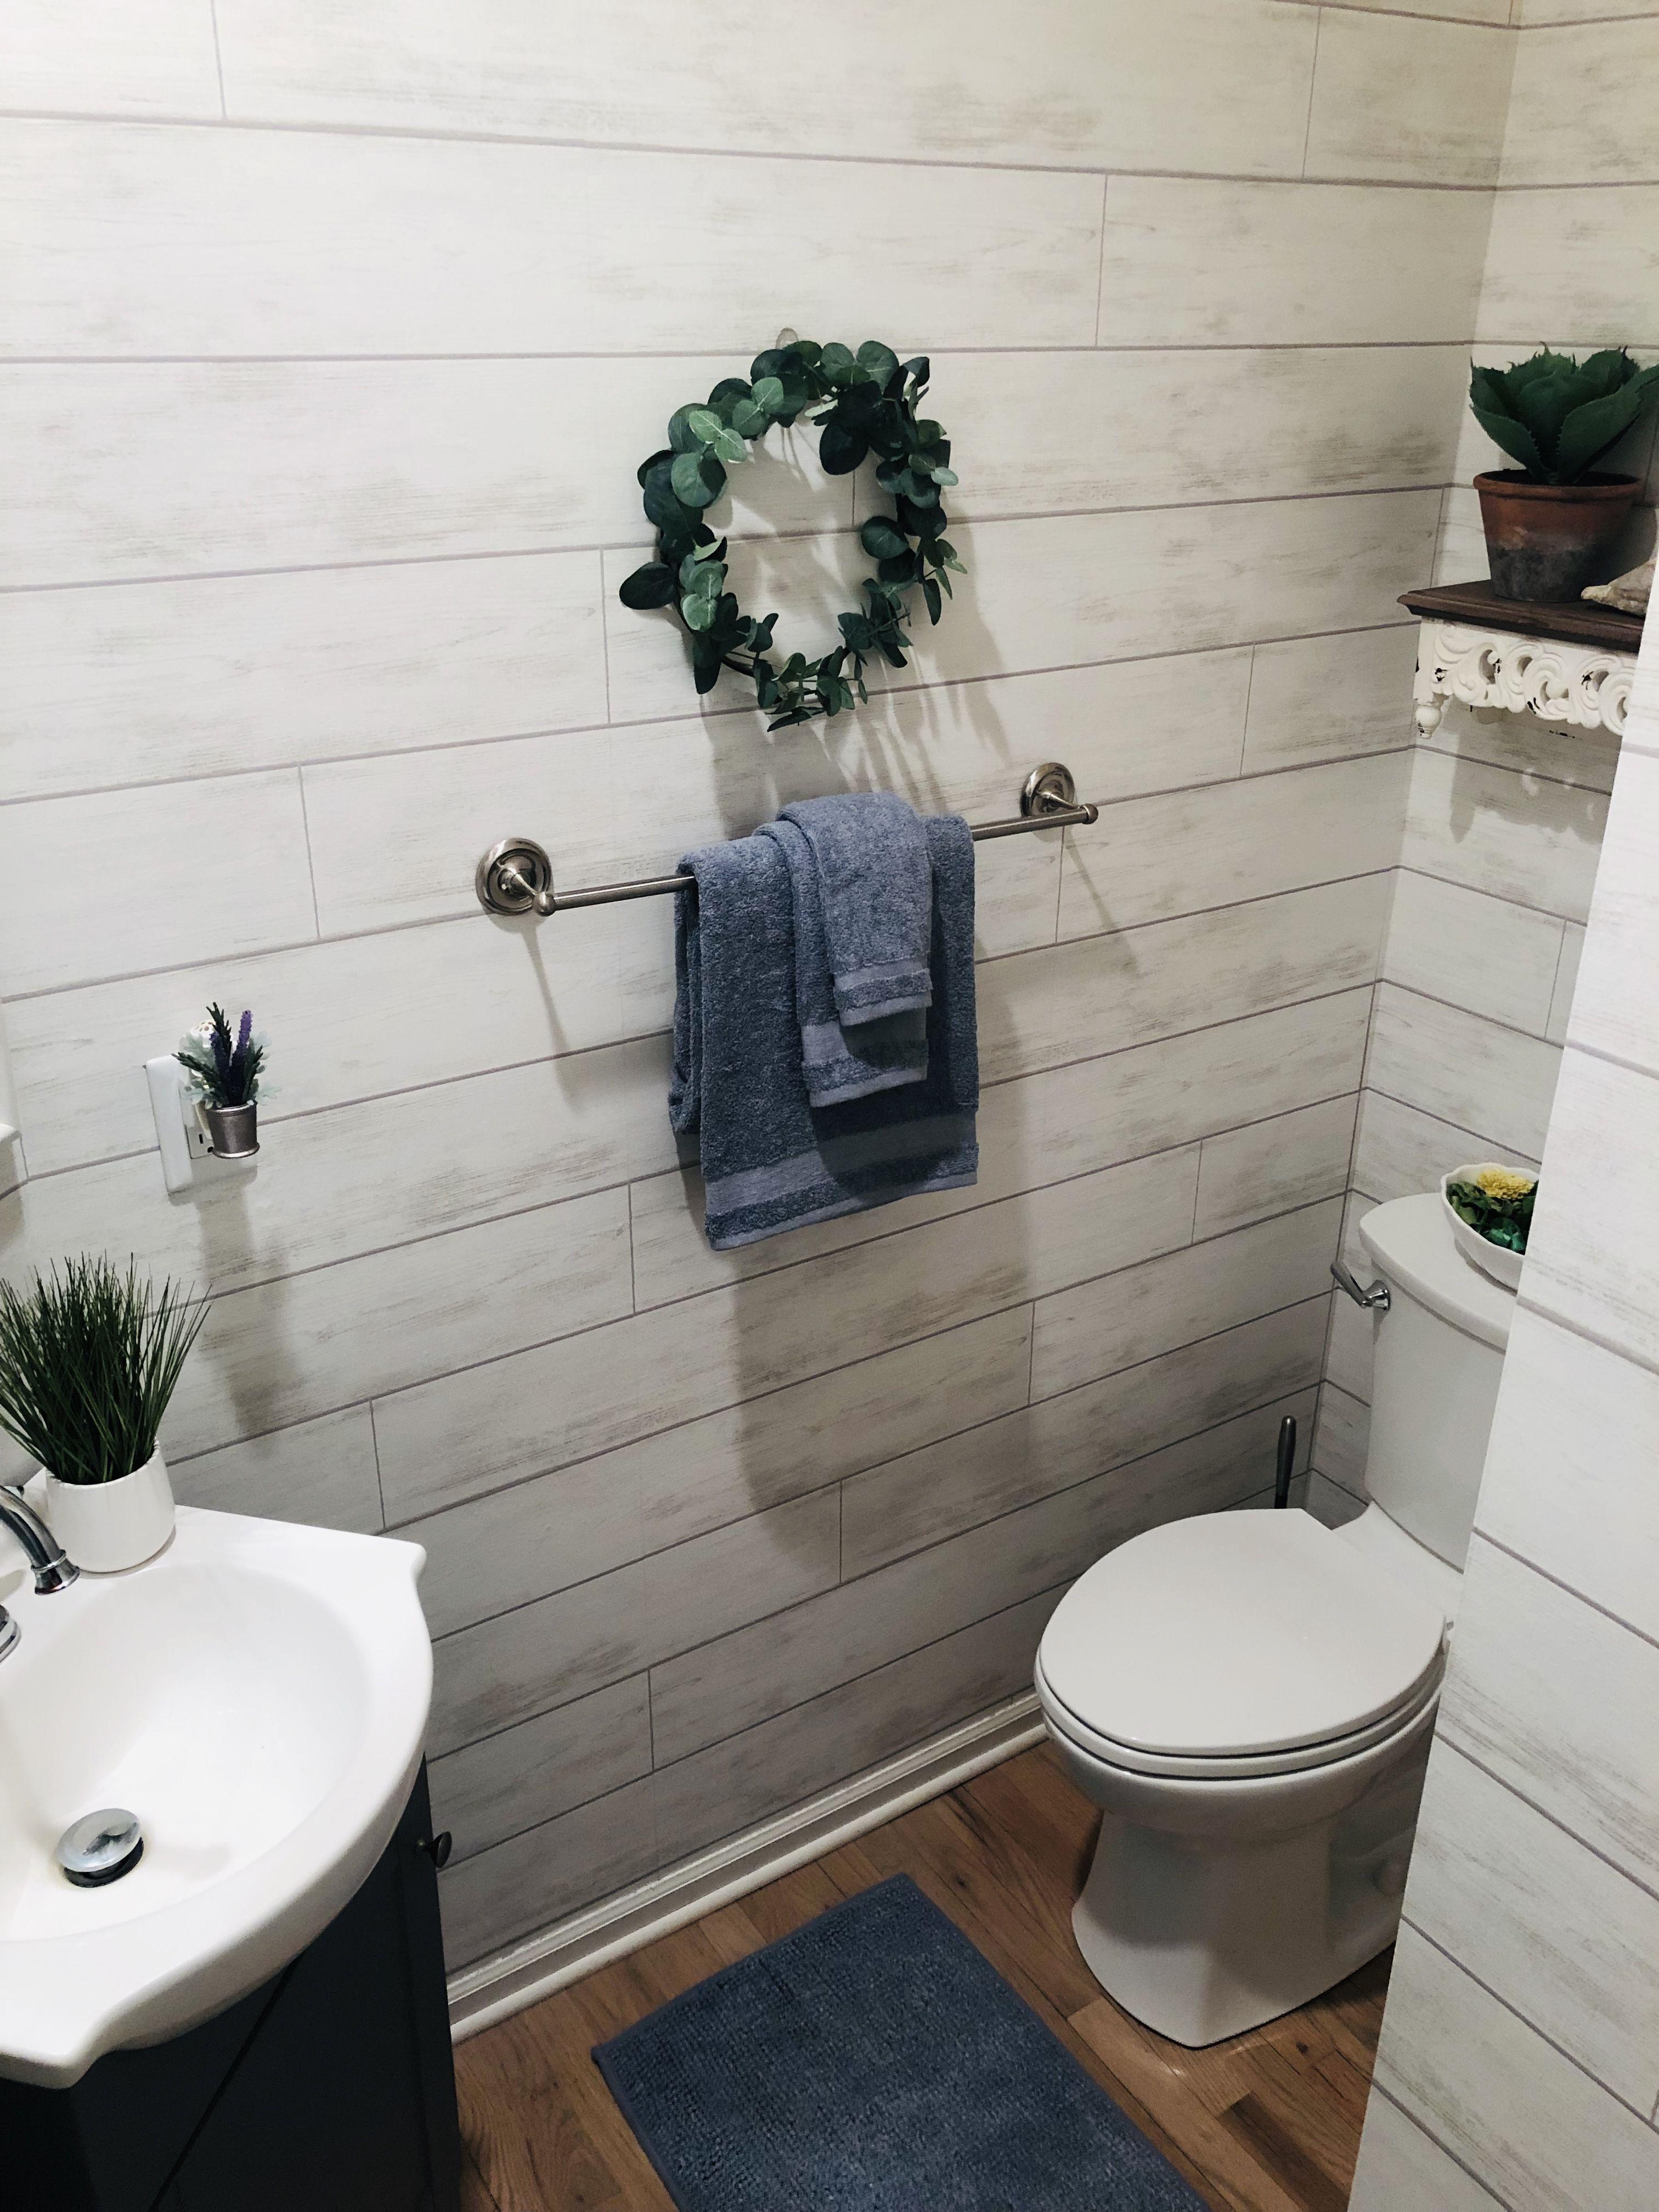 Shiplap Bathroom Joanna Gaines Wallpaper Shiplap Bathroom Bathroom Wallpaper Trends Joanna Gaines Wallpaper